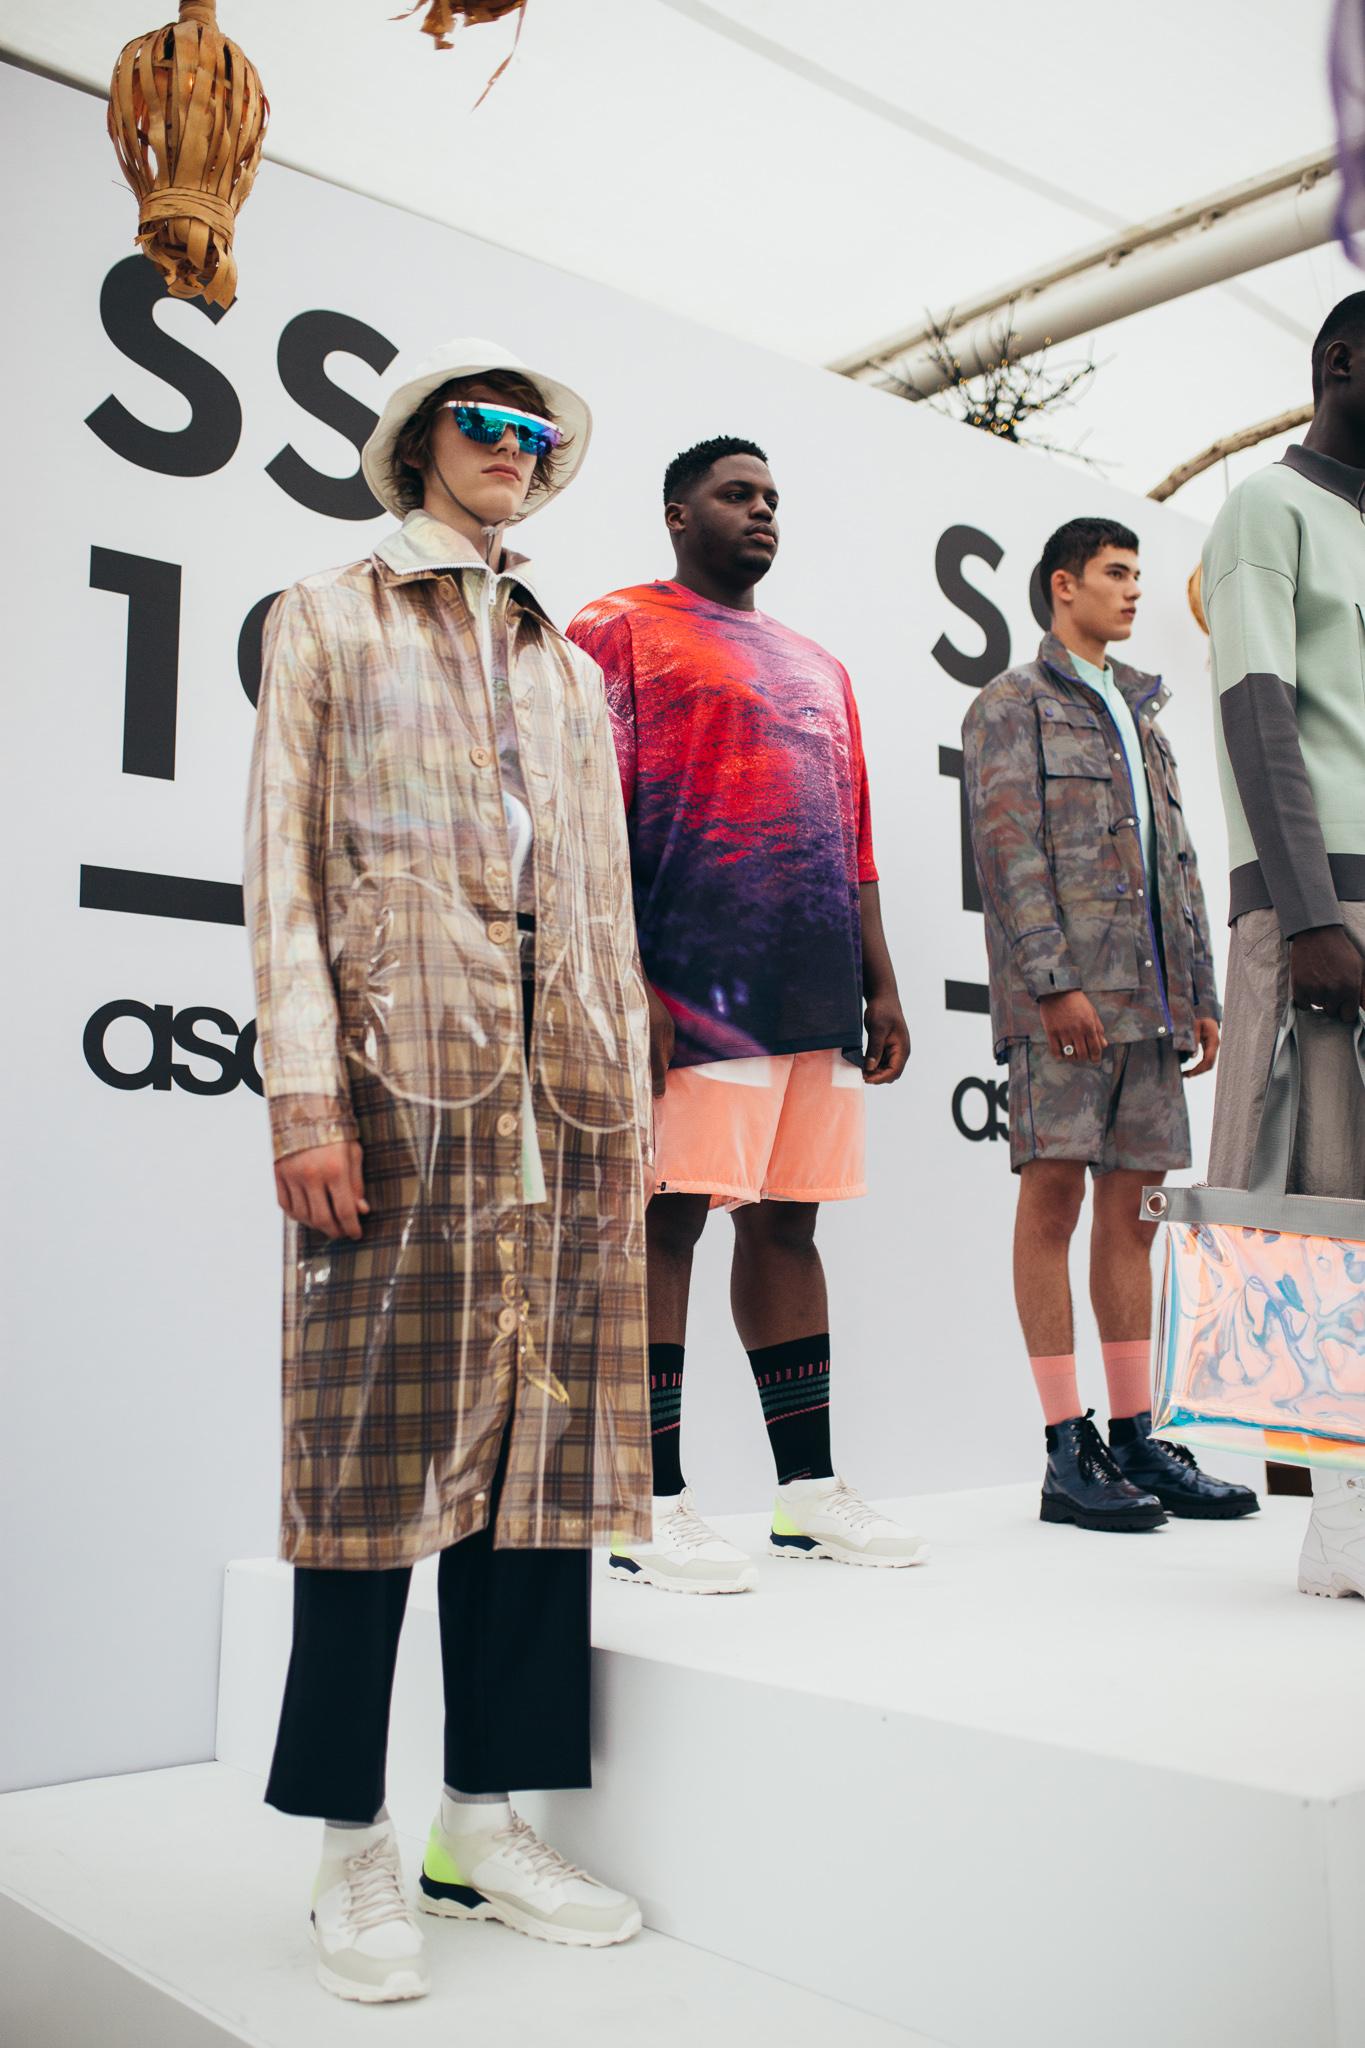 ASOS - London Fashion Week - SS19 - Jungle Magazine